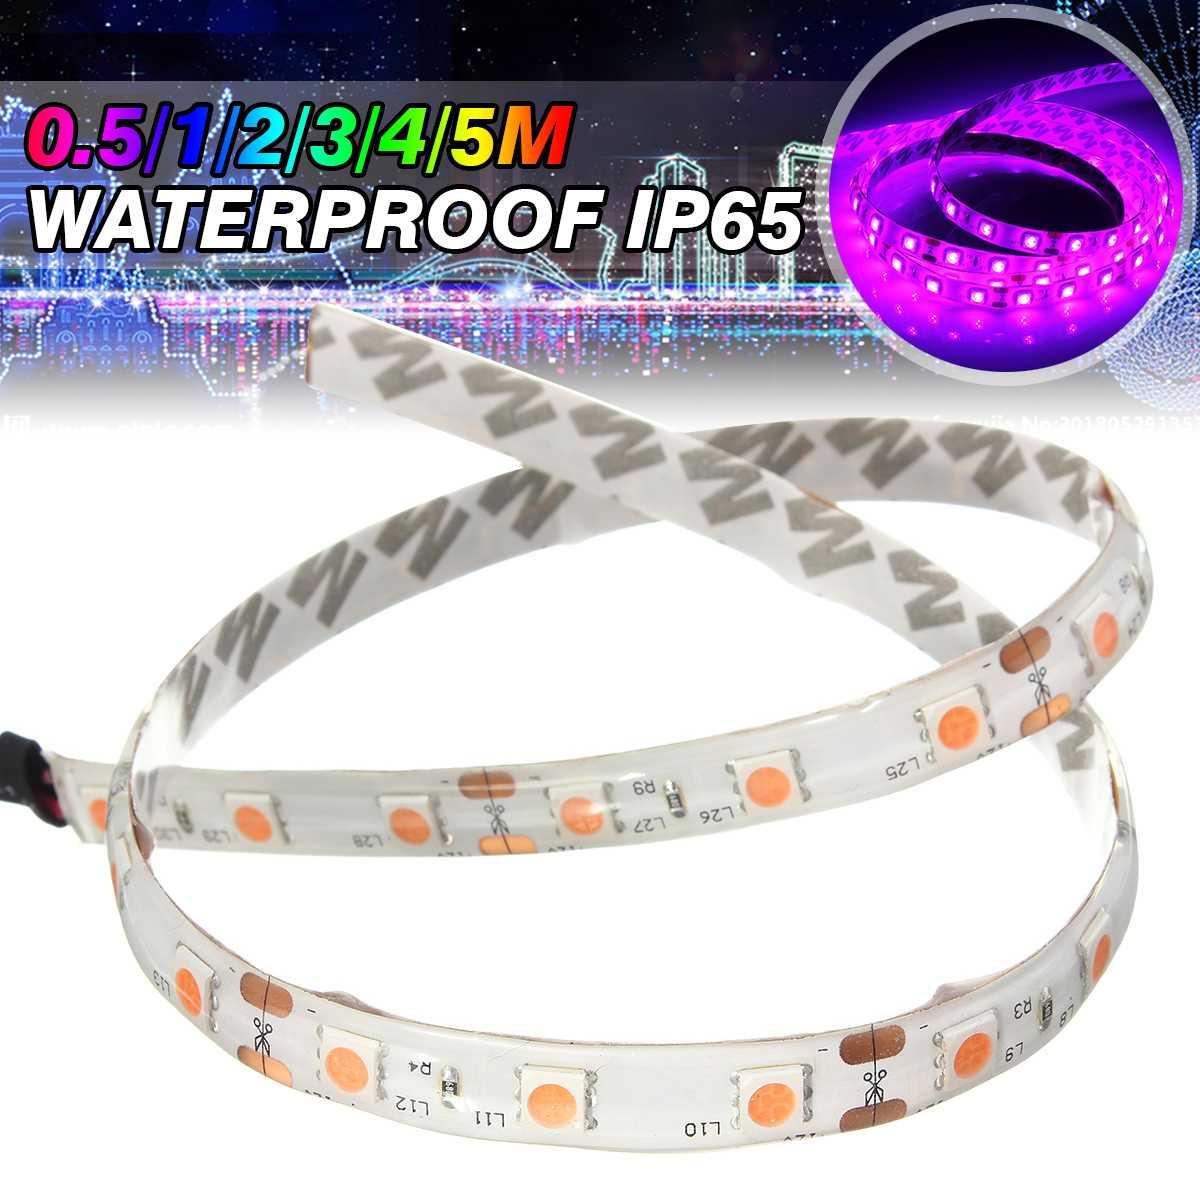 0.5/1/2/3/4/5M UV Lamp Ultraviolet Purple Led Strip Light 12V DC 5050 SMD Black LED Lamp 395-405nm Strip Light Waterproof IP65